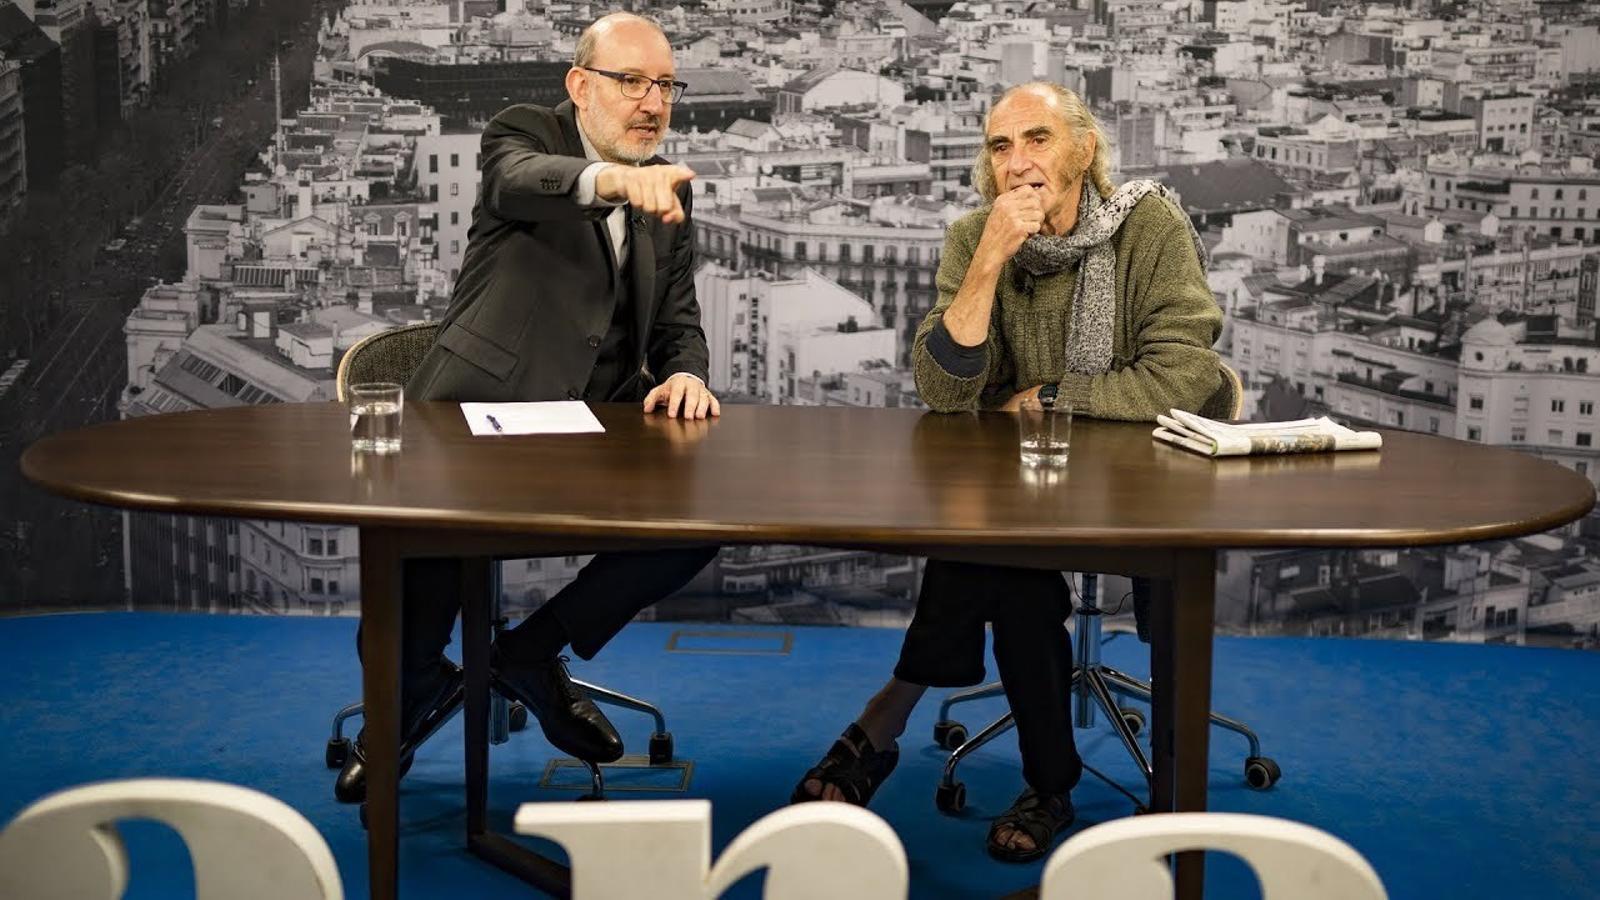 Entrevista d'Antoni Bassas a Pau Riba